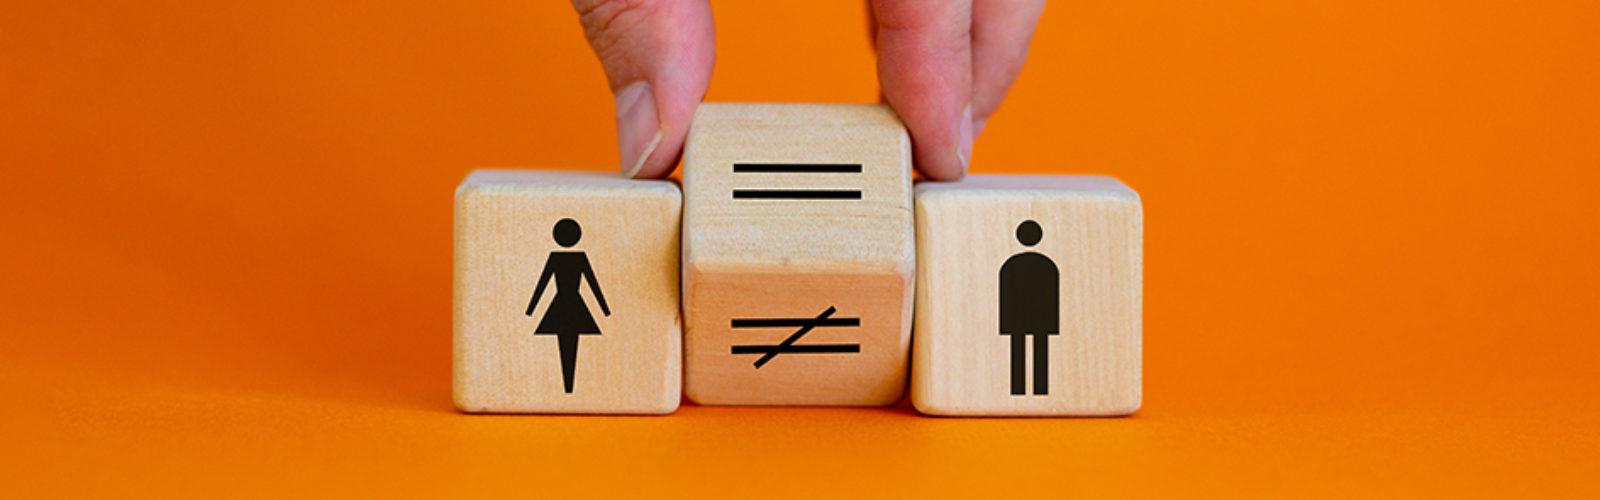 Gender-Equality(bs409880272).jpg